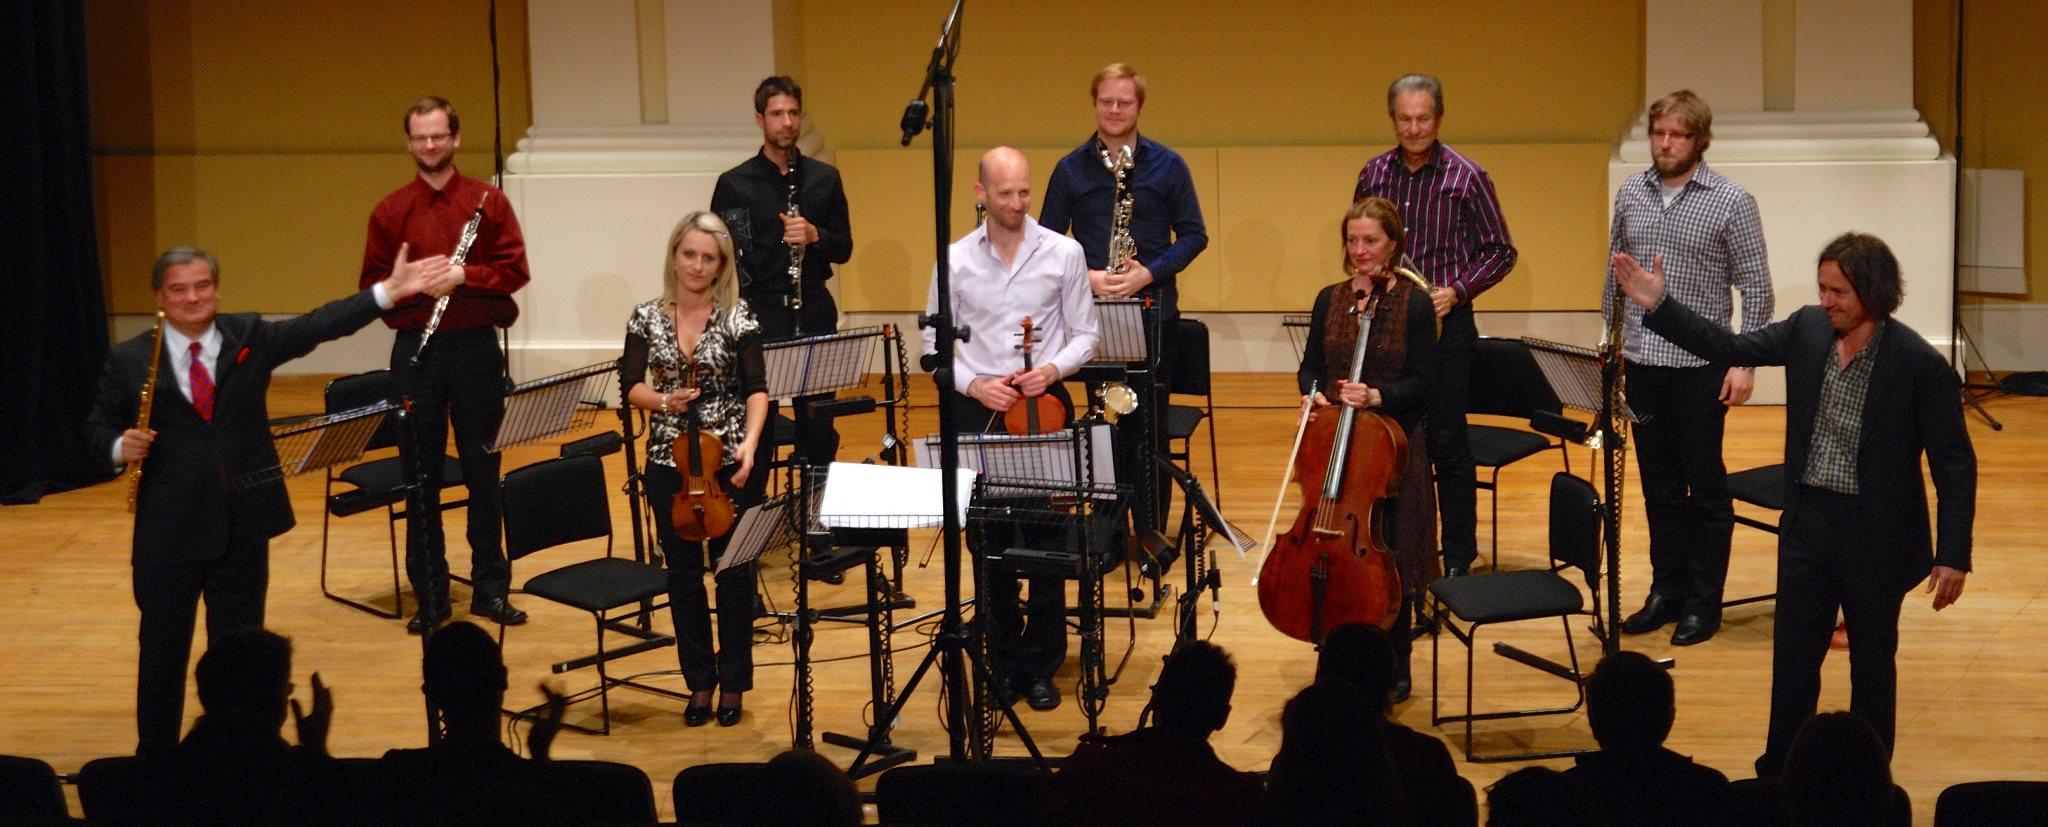 Cavallone's Horos with the Stroma Ensemble cond. Hamish McKeich, flute R. Fabbriciani